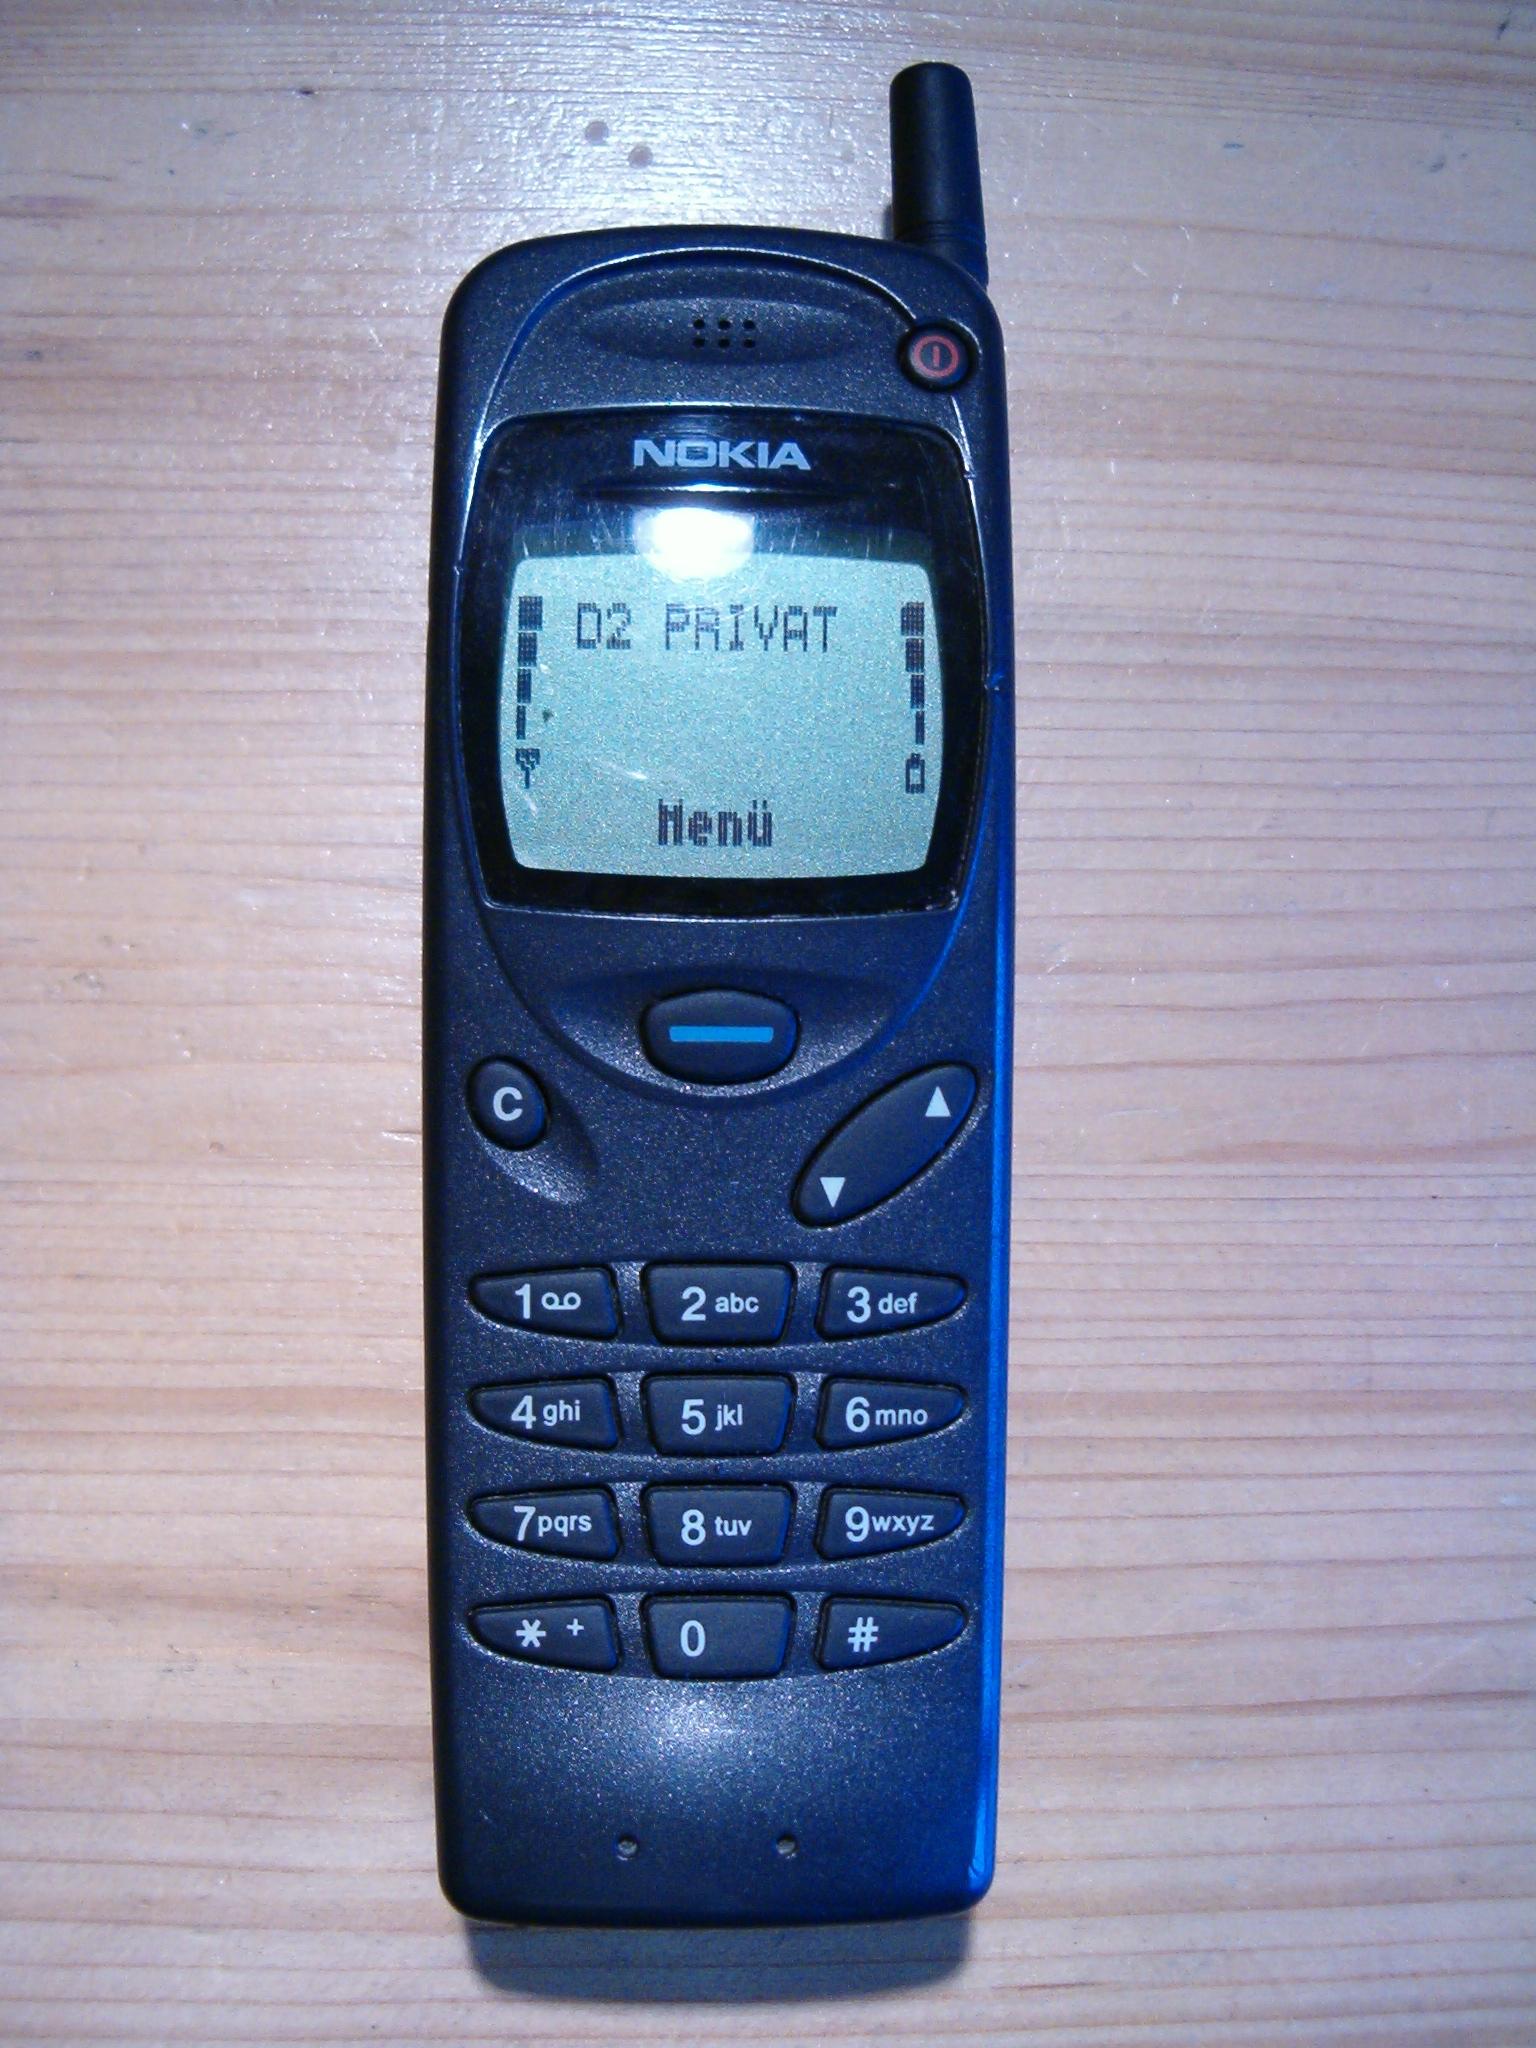 File:Nokia 3110.jpg - Wikimedia Commons